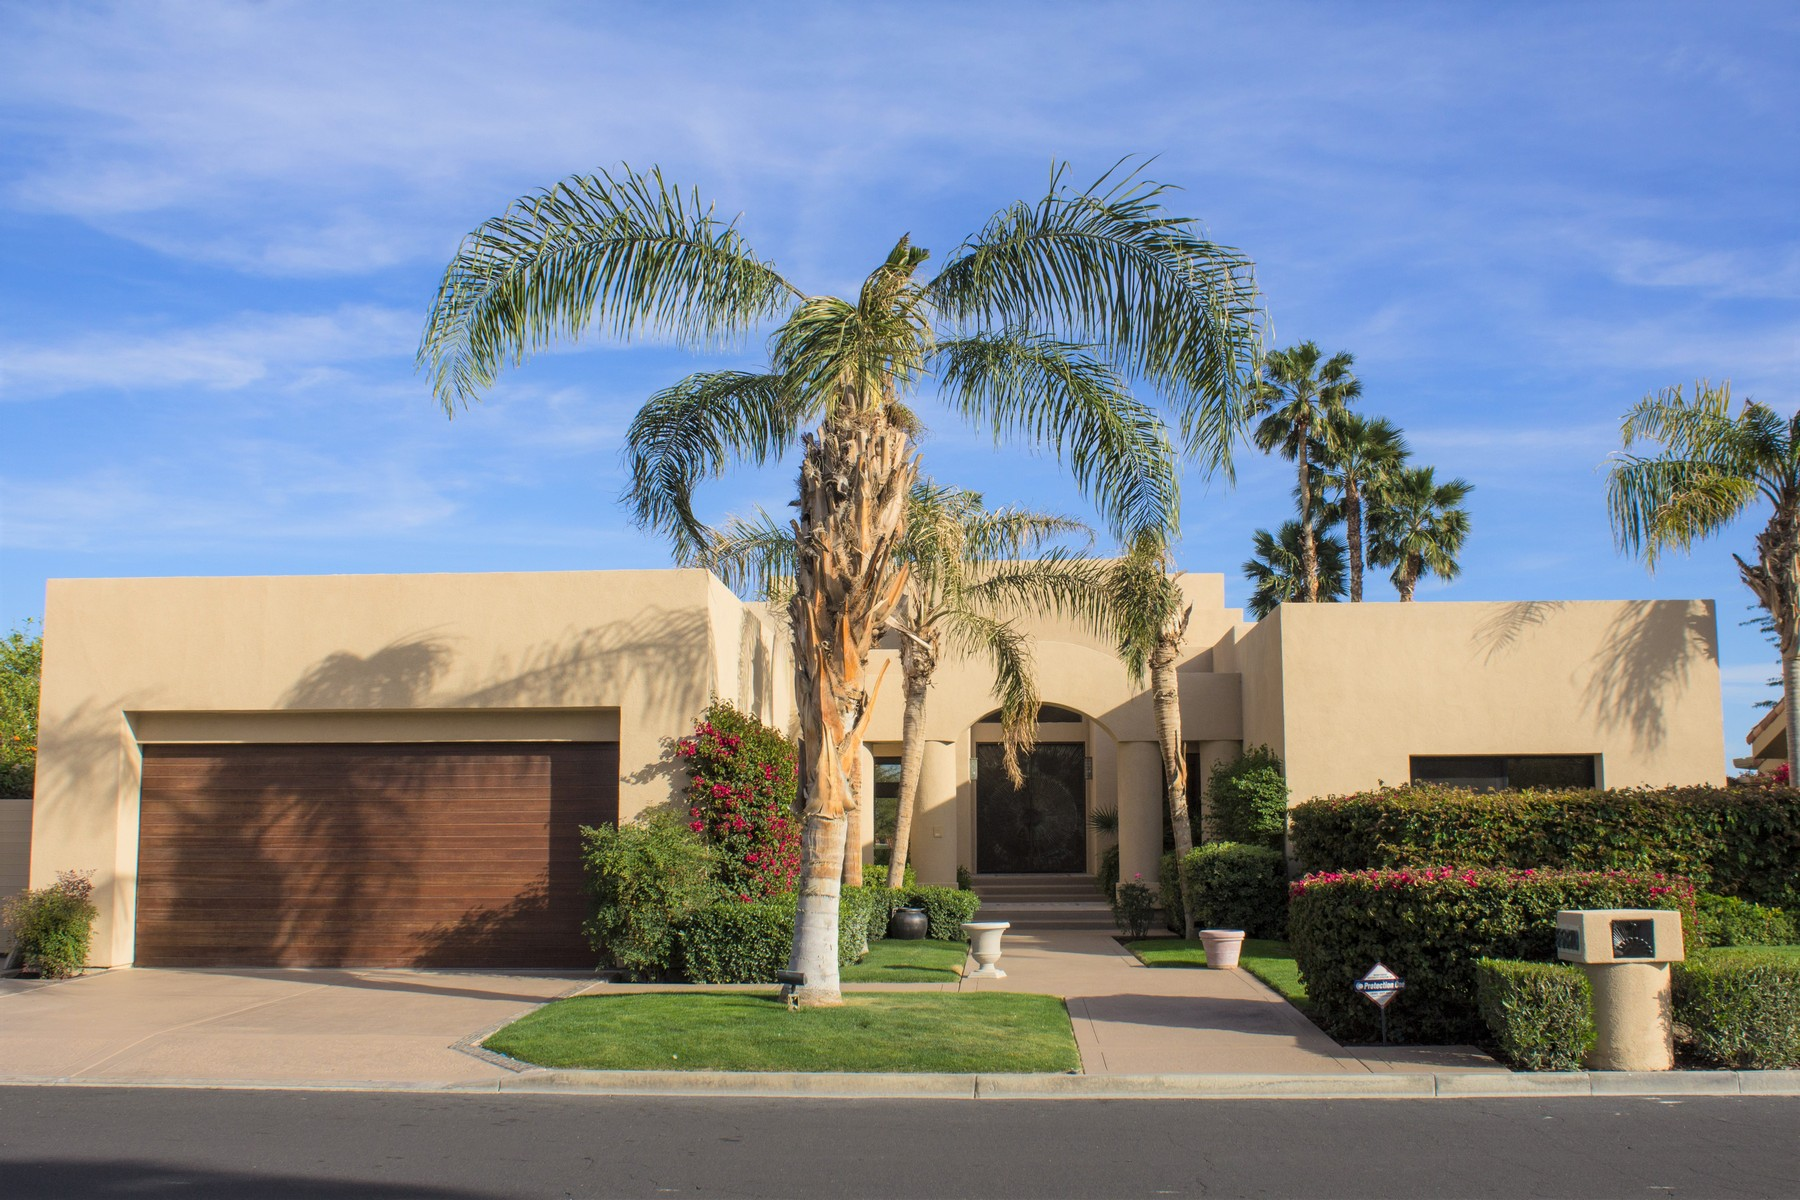 Single Family Home for Sale at 55870 Pebble Beach La Quinta, California 92253 United States